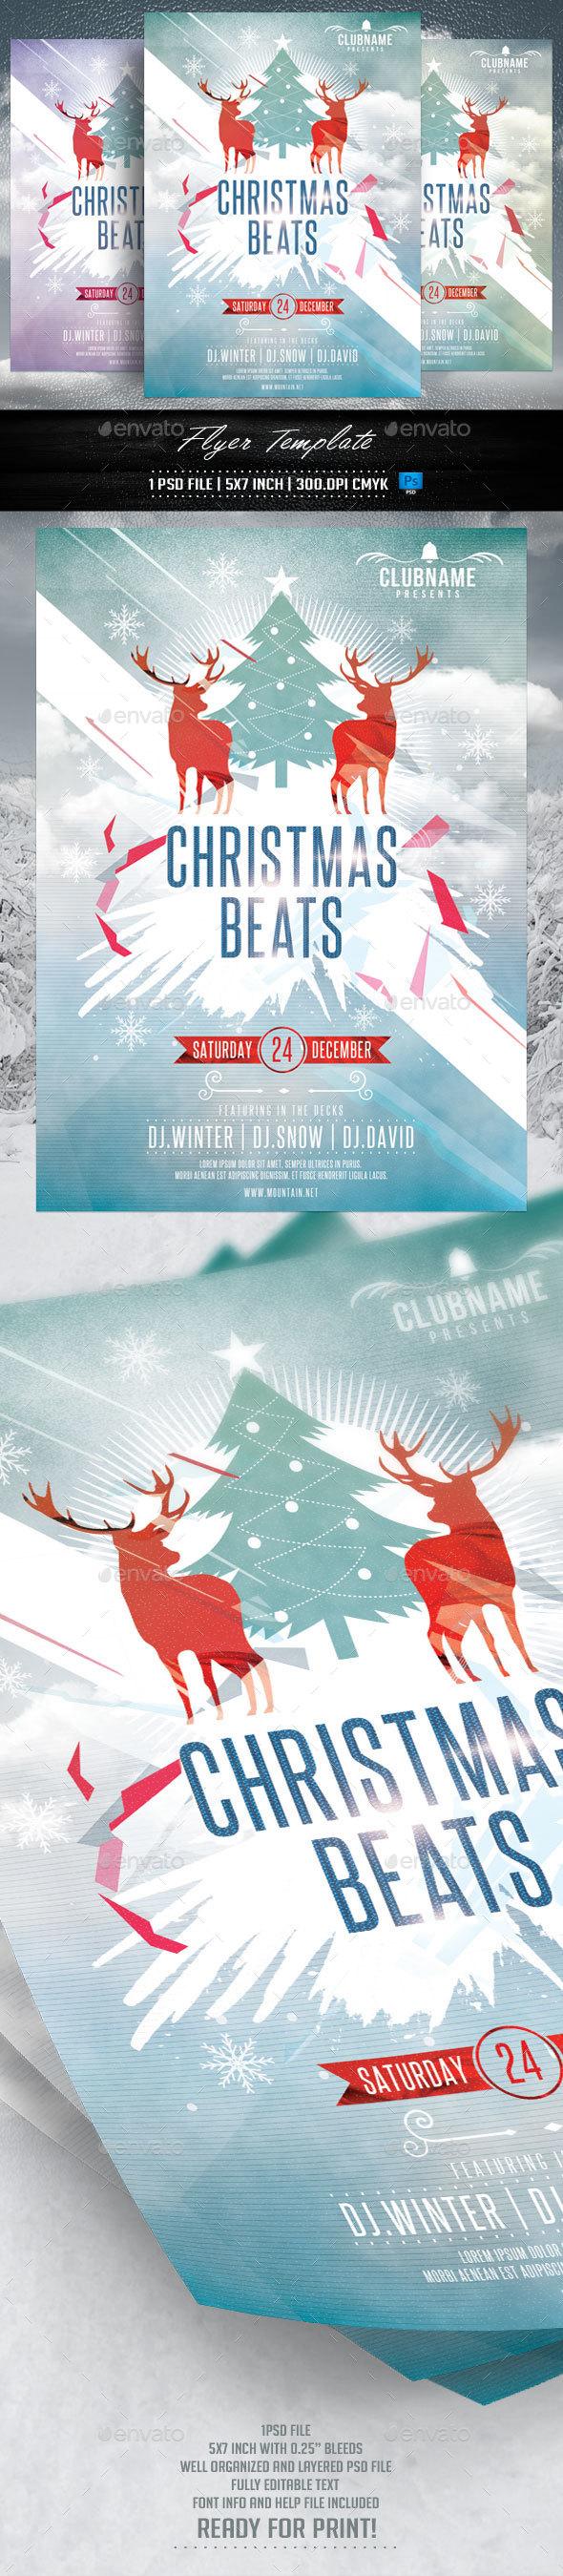 Christmas Beats Flyer - Holidays Events